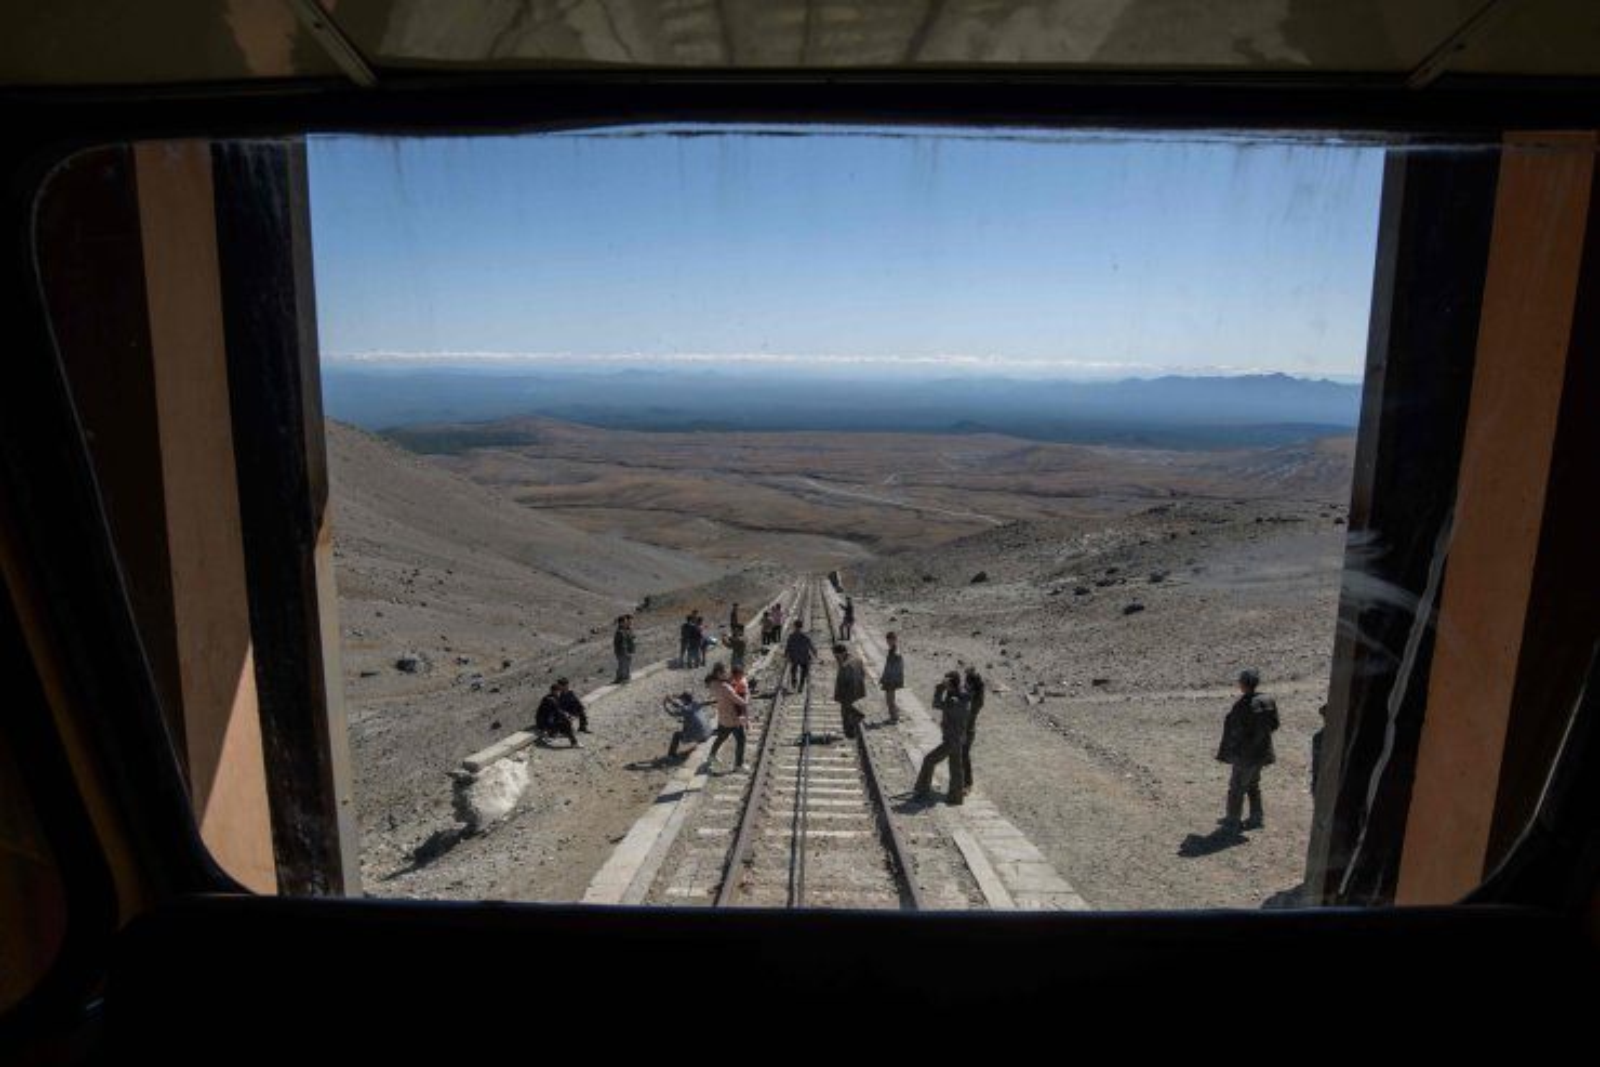 In a photo taken on September 11, 2019, North Korean visitors take photos after riding a funicular railway to a viewing platform near the summit of Mount Paektu, near Samjiyon. AFP